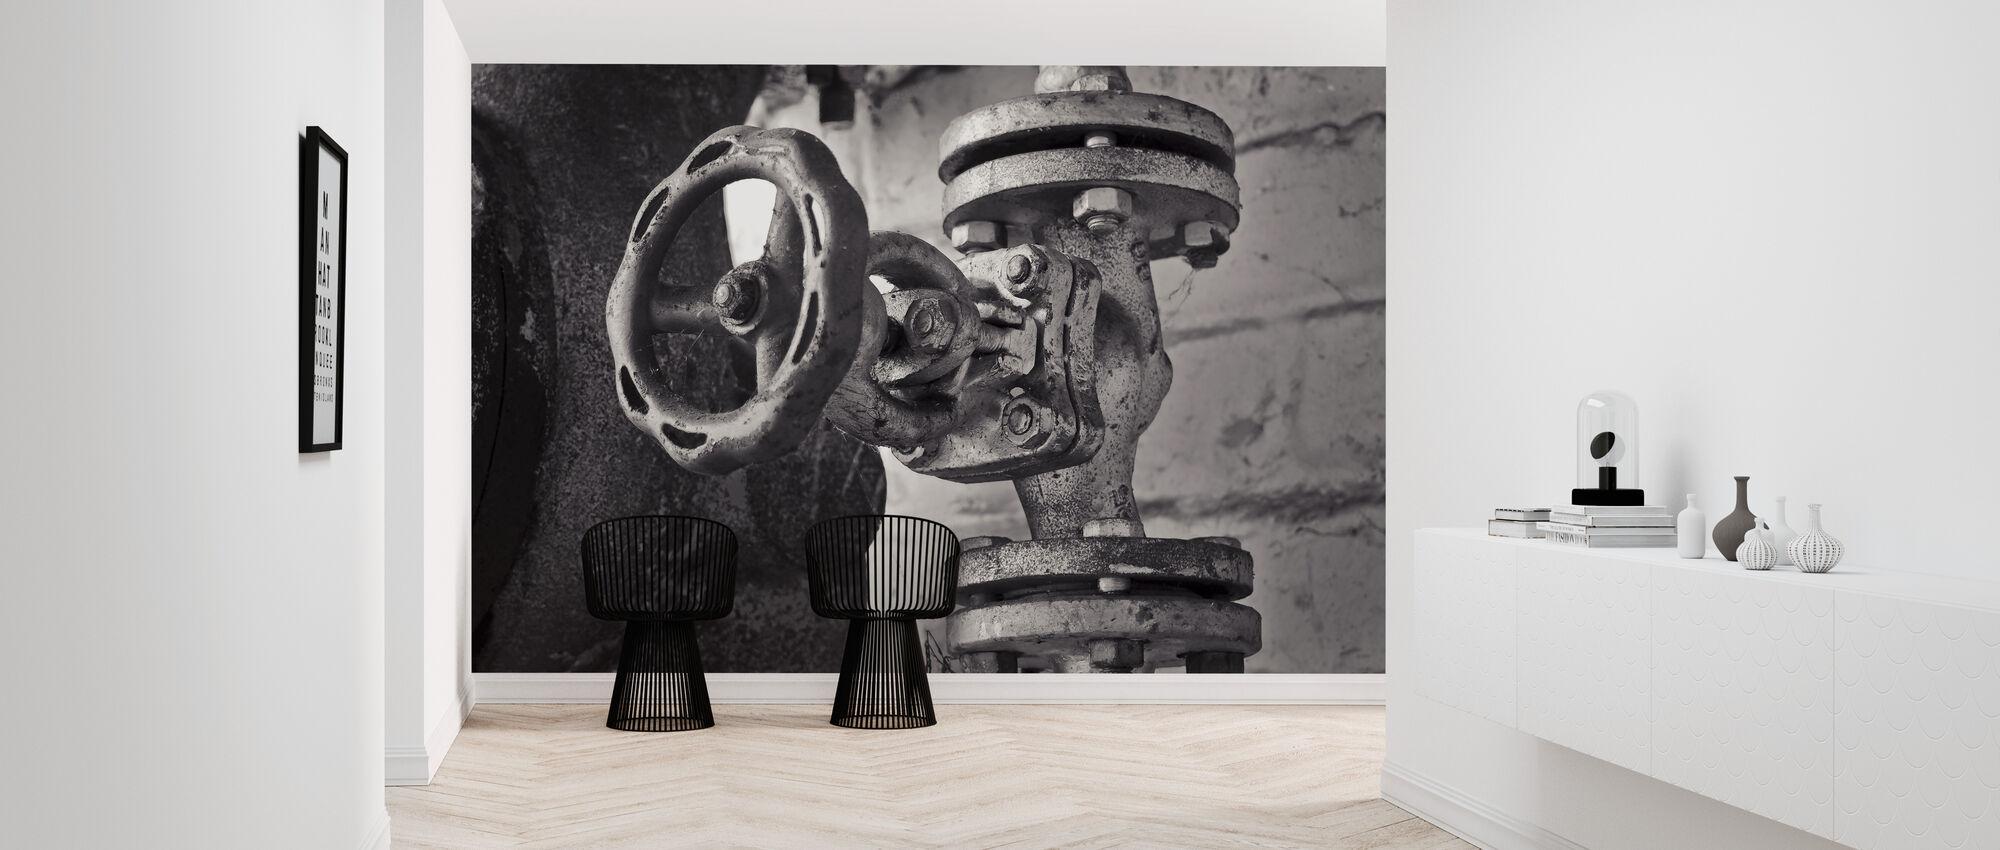 Valve and Pipeline - Wallpaper - Hallway